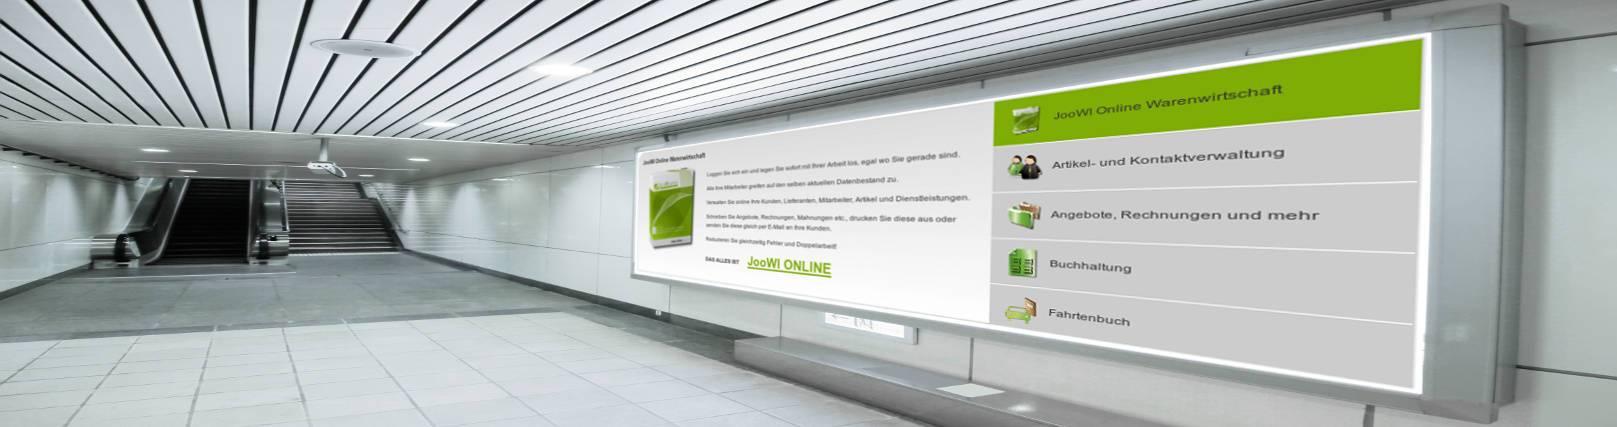 media-print-joowi-banner